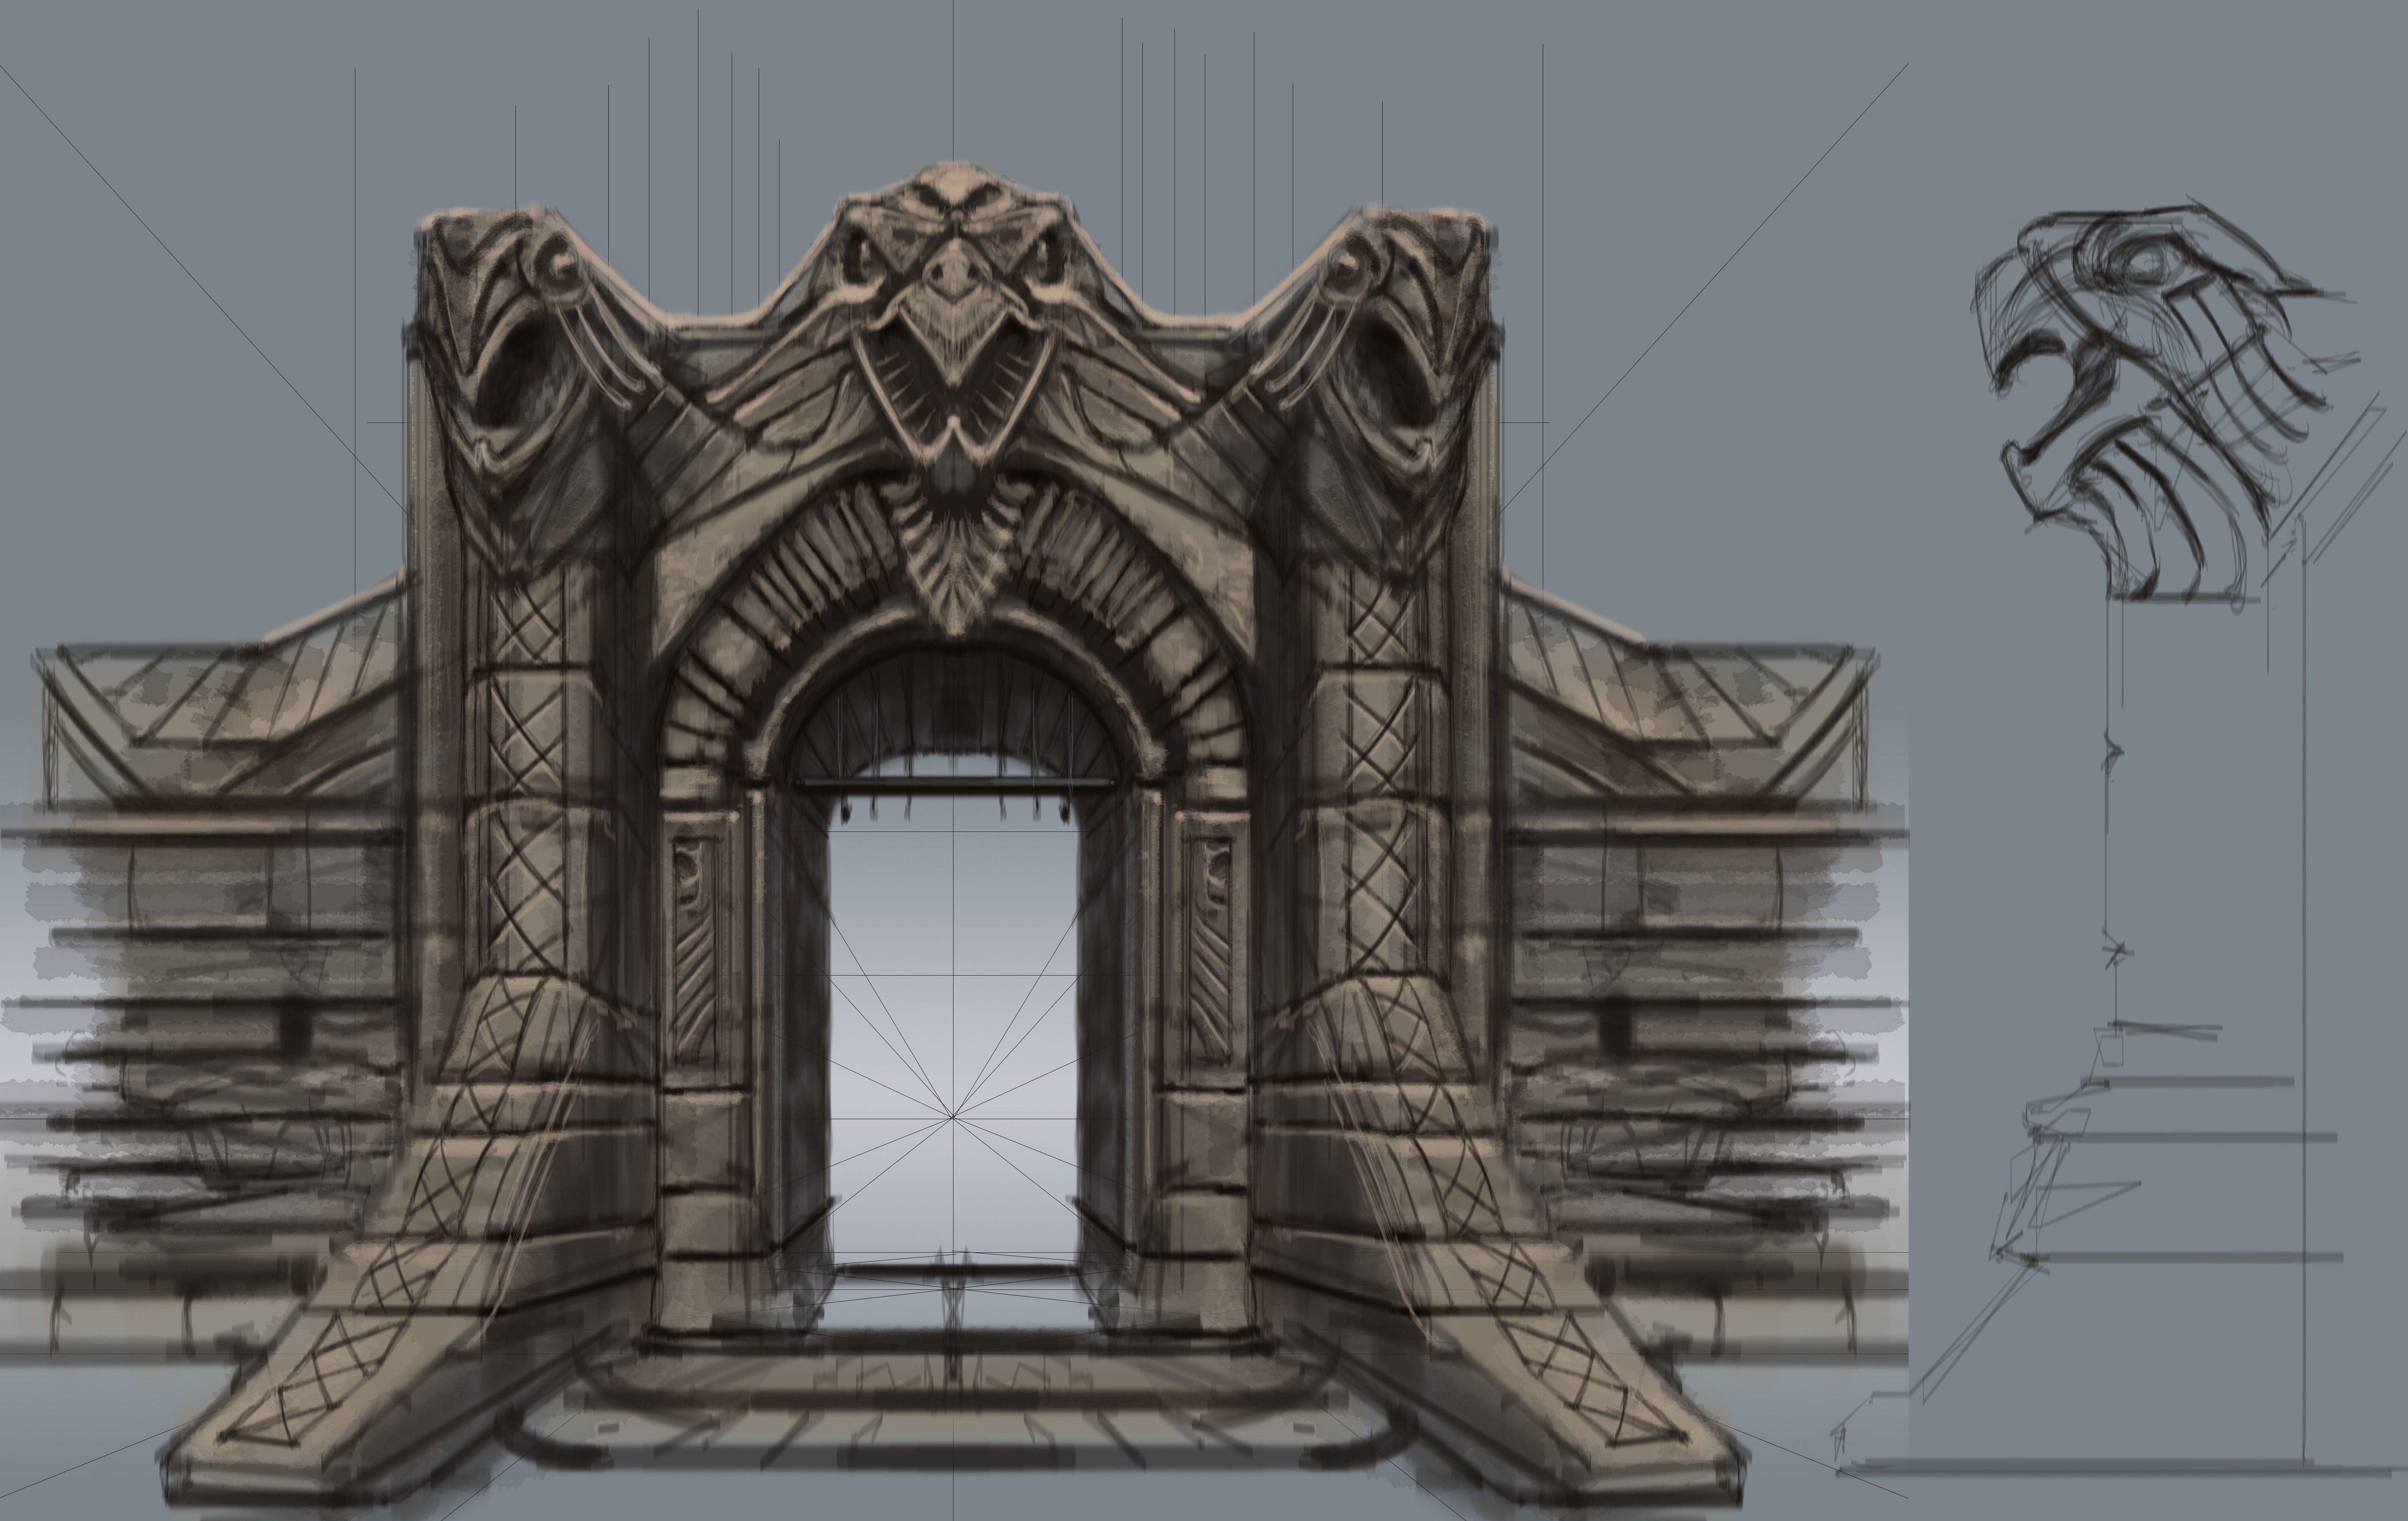 Windhelm gate concept art elder scrolls pinterest skyrim and concept art - Several artistic concepts for main door ...